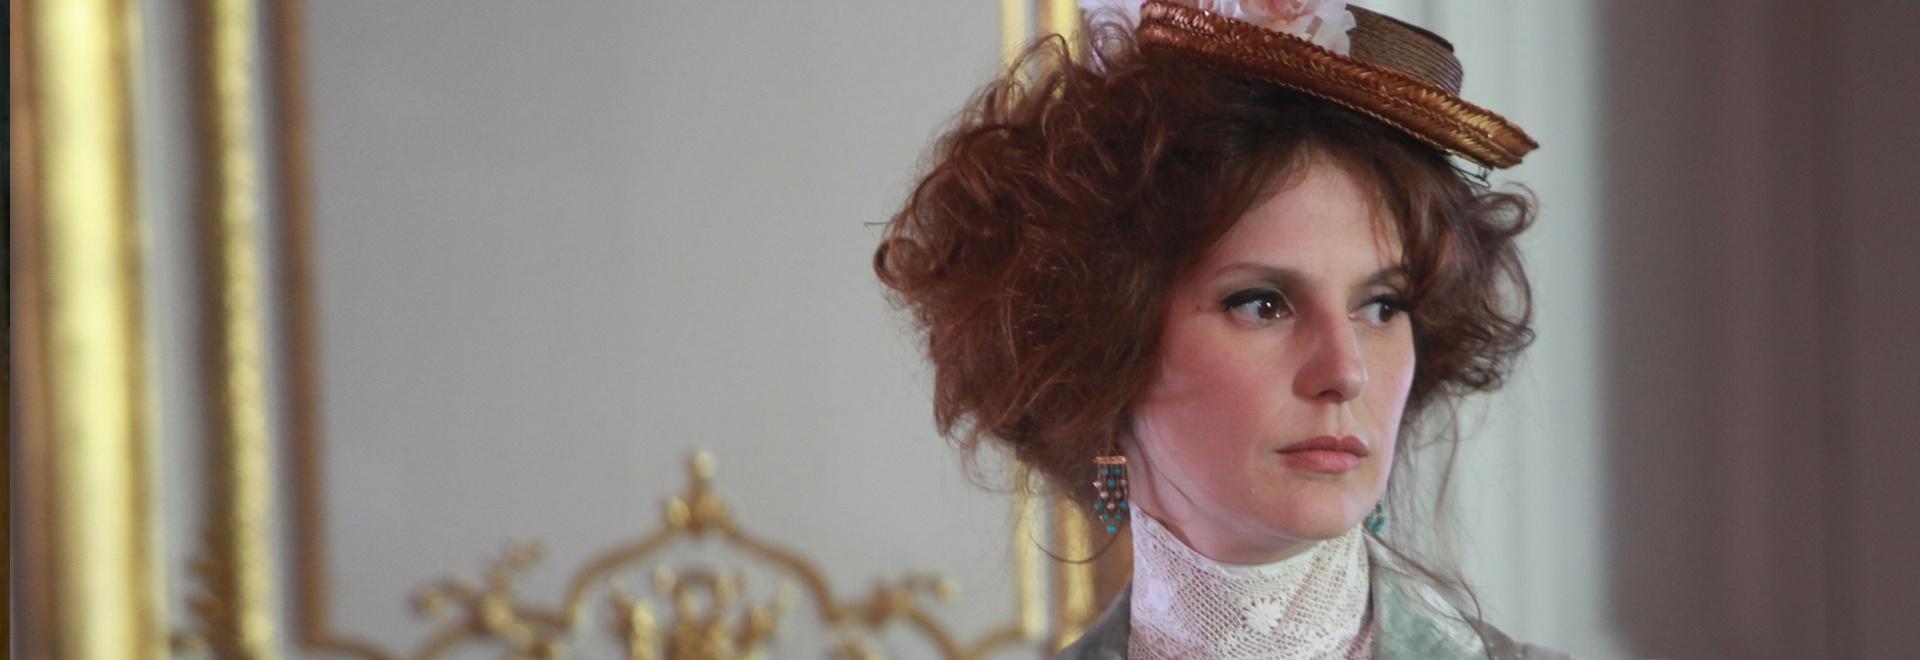 Mistero all'Opera Garnier